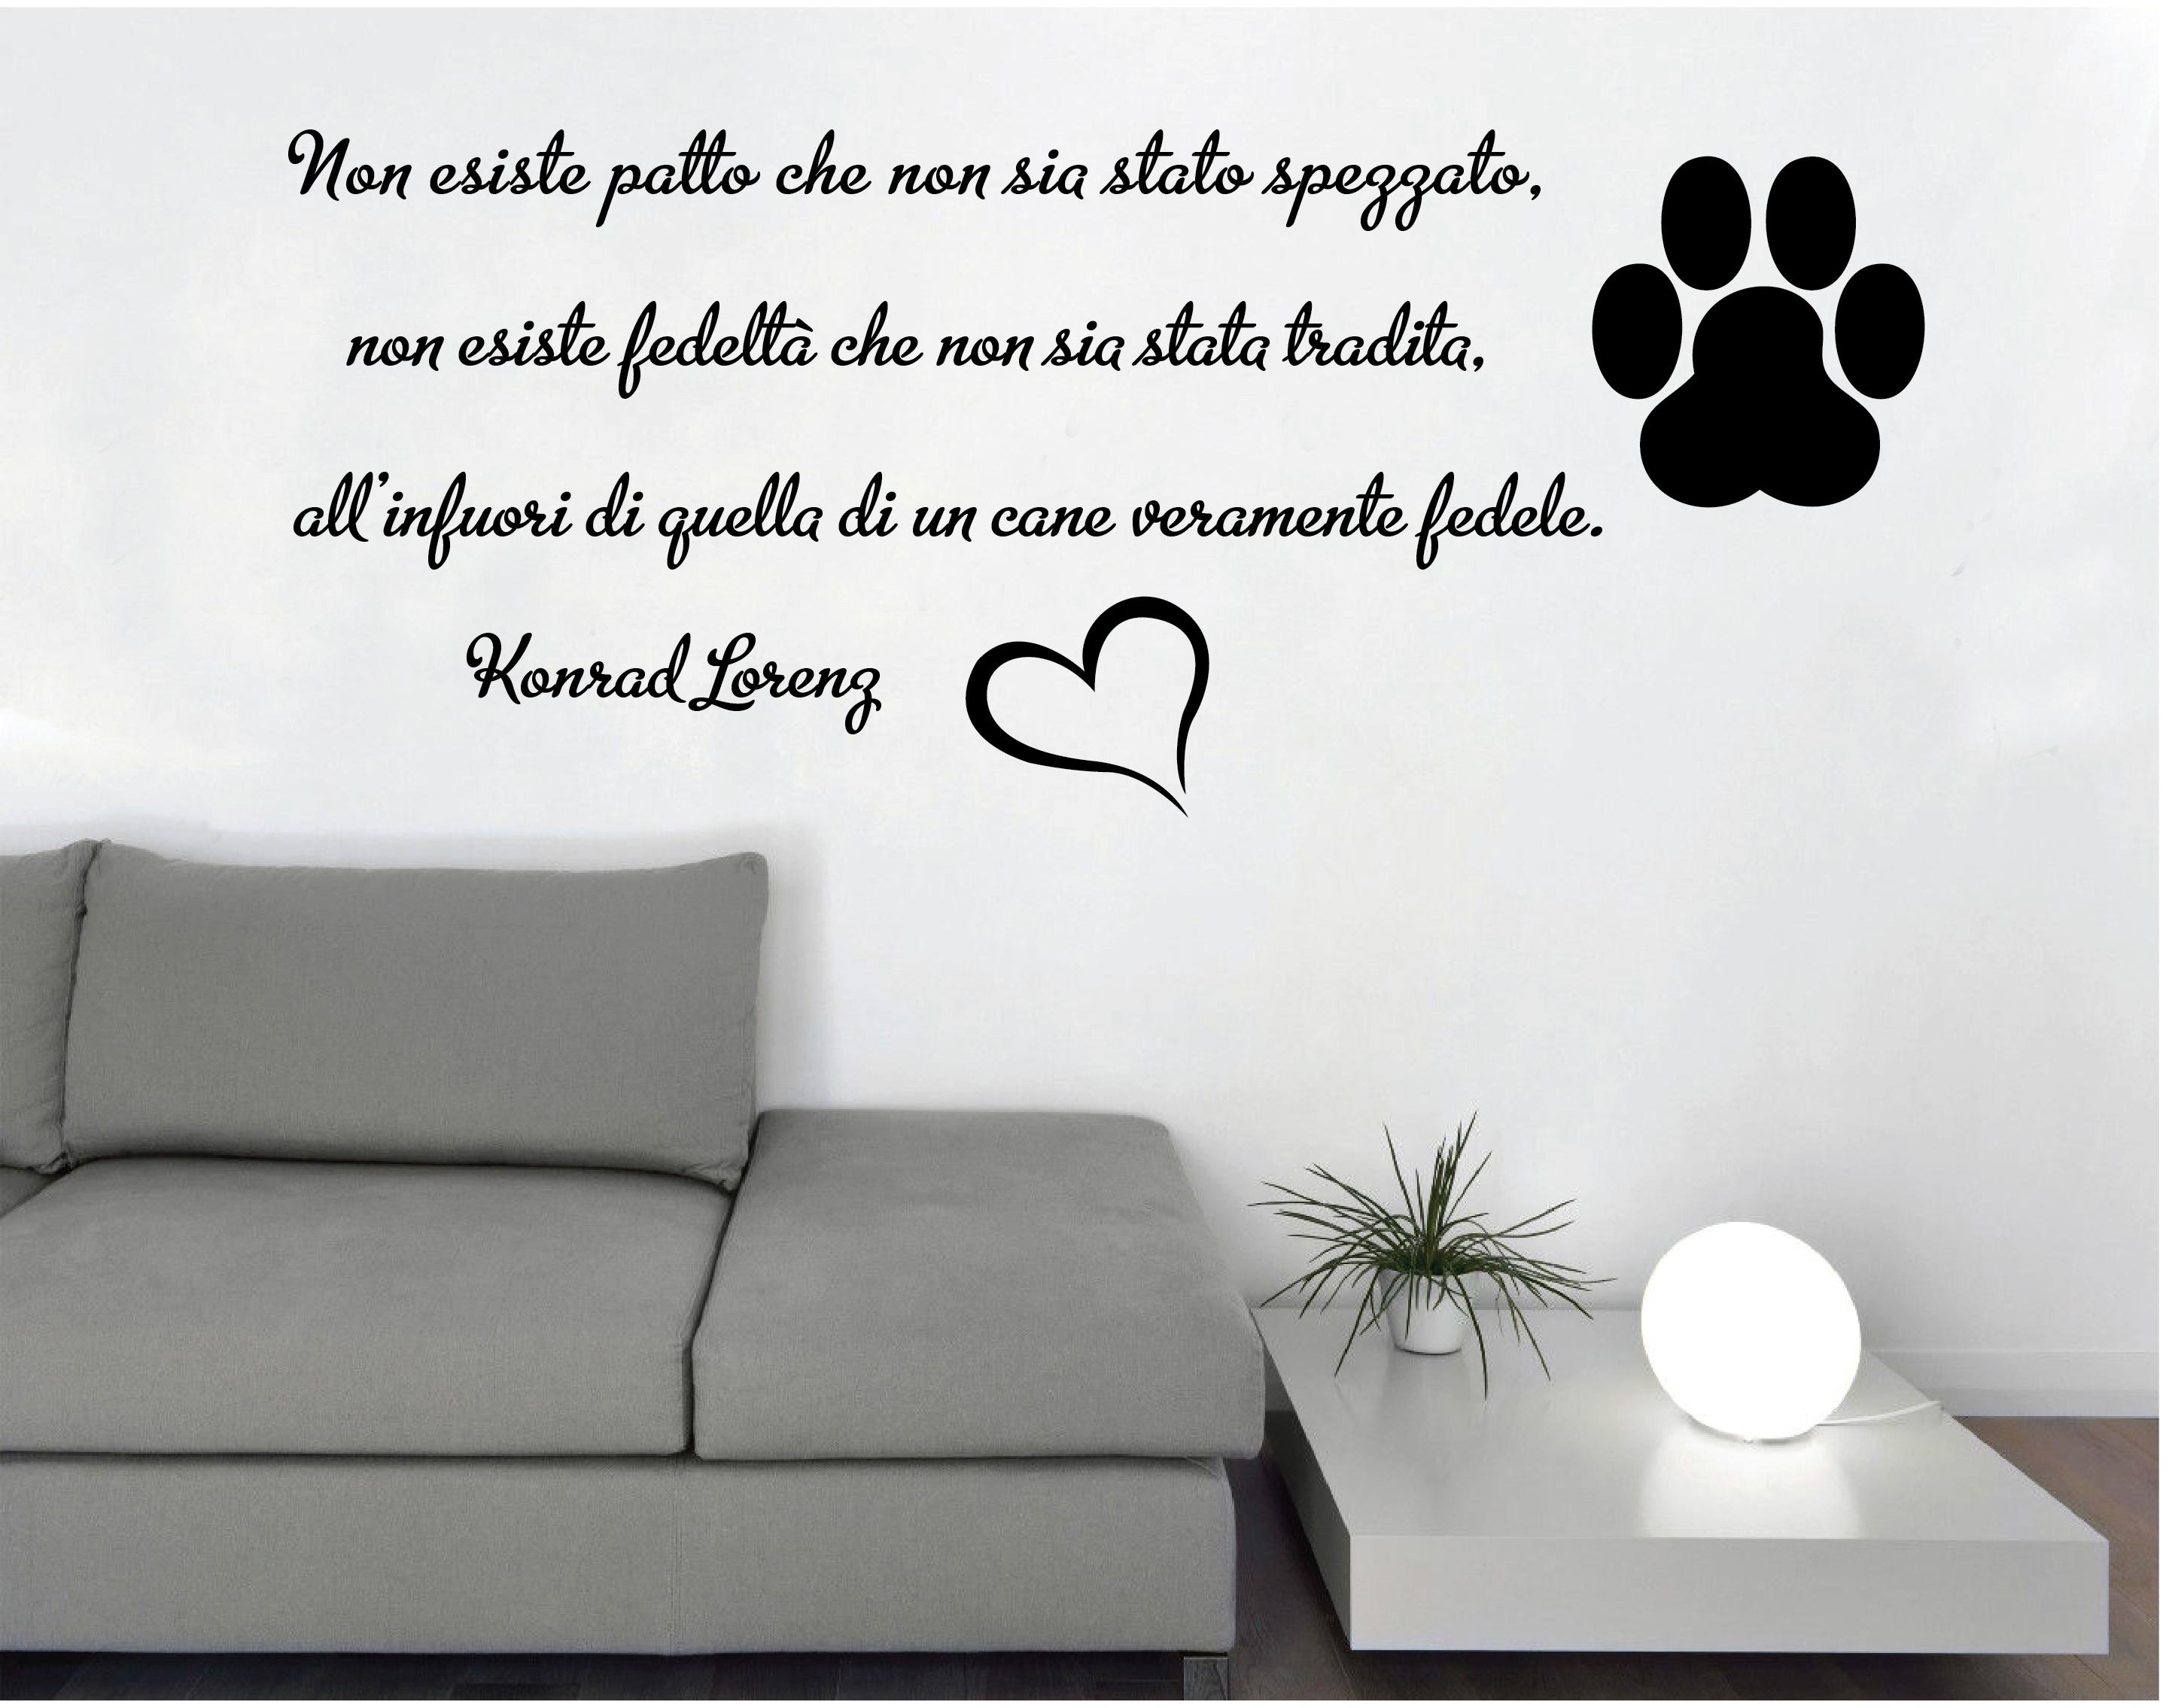 WALL STICKERS ADESIVI MURALI Frase Cane Fedele Parete Muro ...